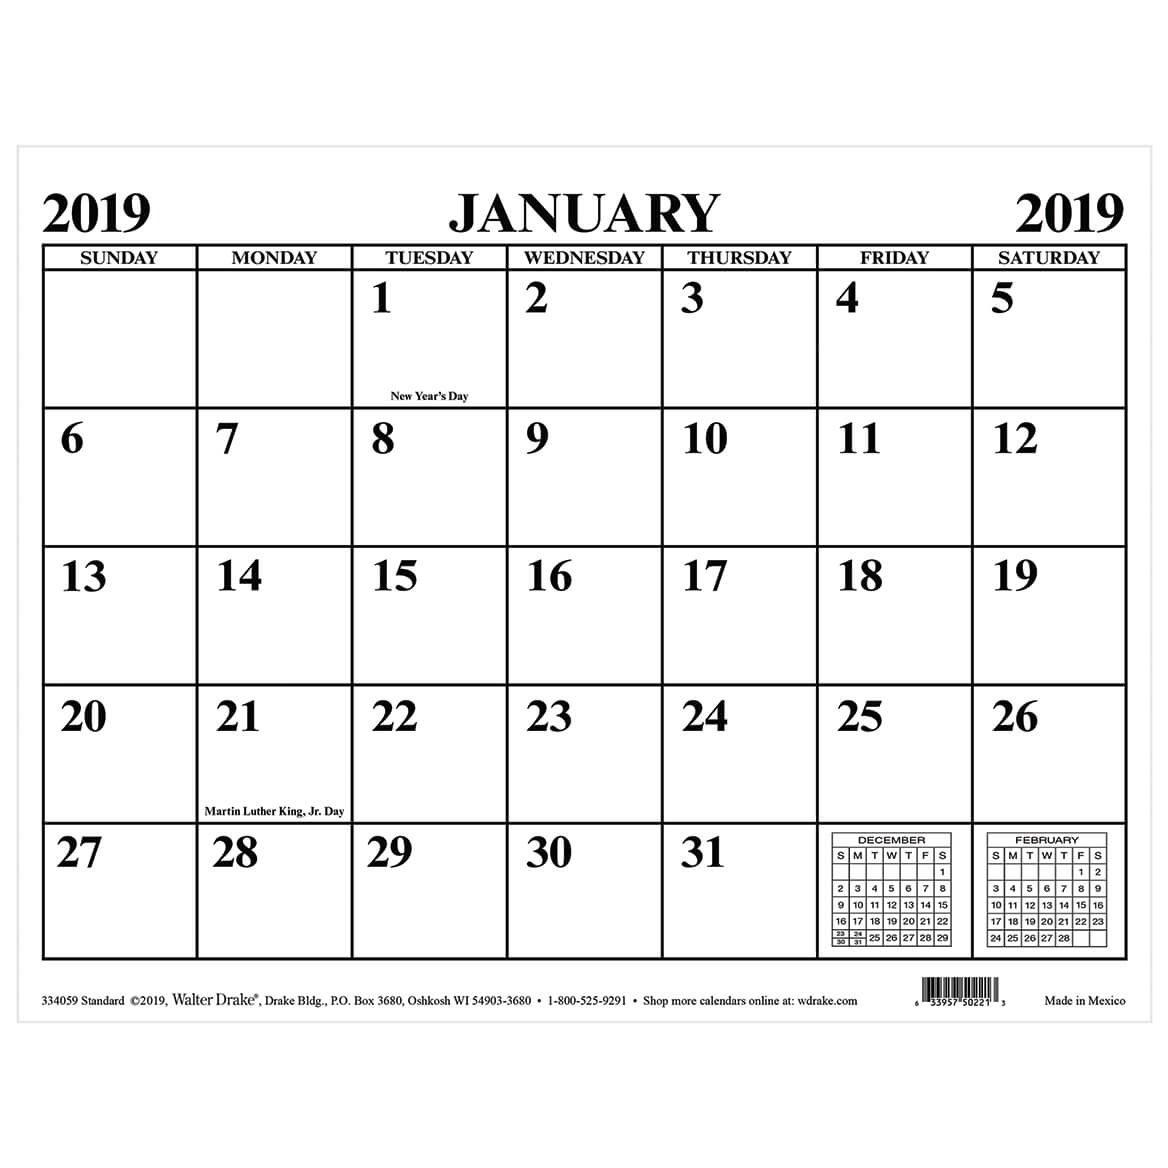 Magnetic Calendar - Monthly Magnetic Calendar - Walter Drake Calendar 2019 Magnet